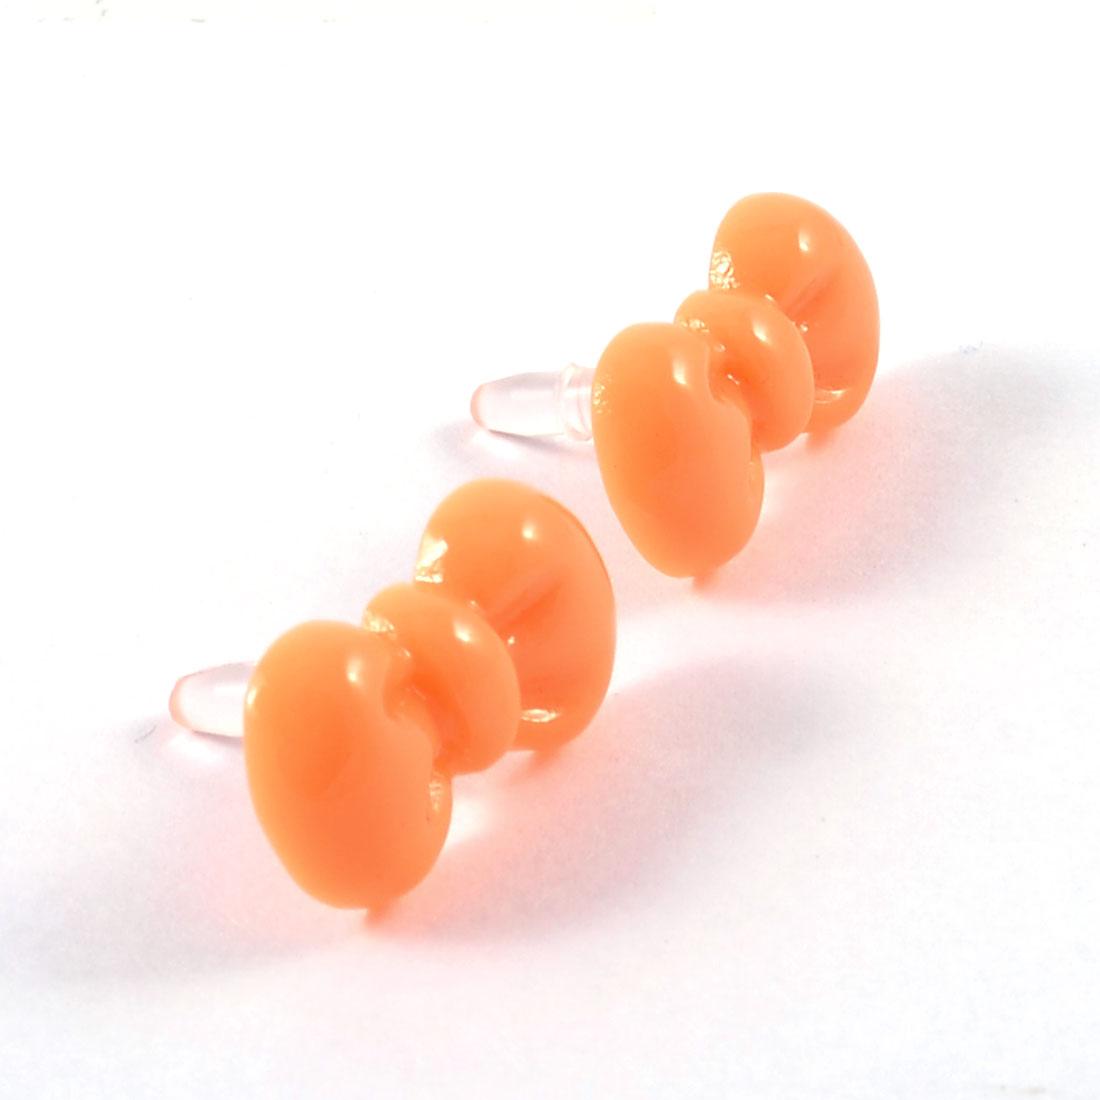 2 Pcs Orange Bowtie 3.5mm Earphone Dust Ear Cap Jack for Cell Phone